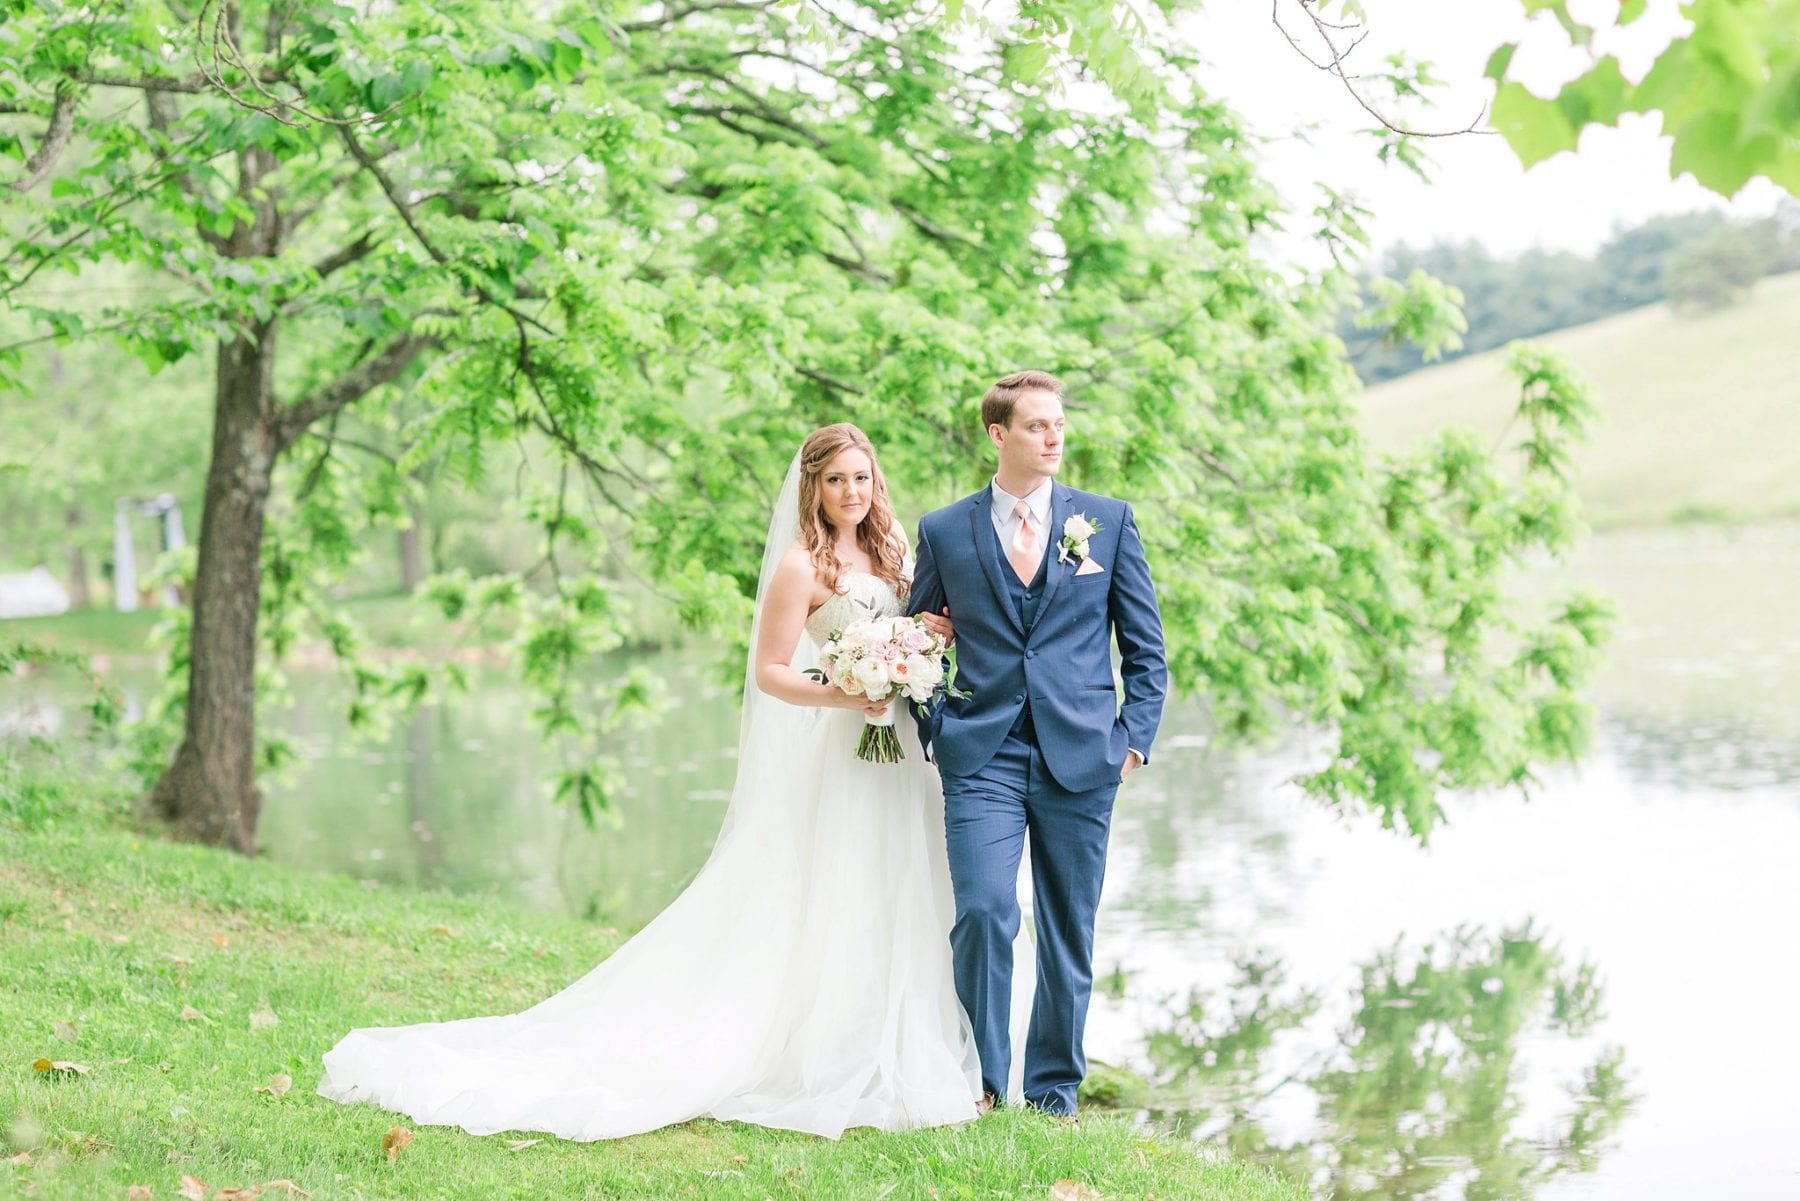 Justin & Megan Big Spring Farm Wedding Photos-194.jpg